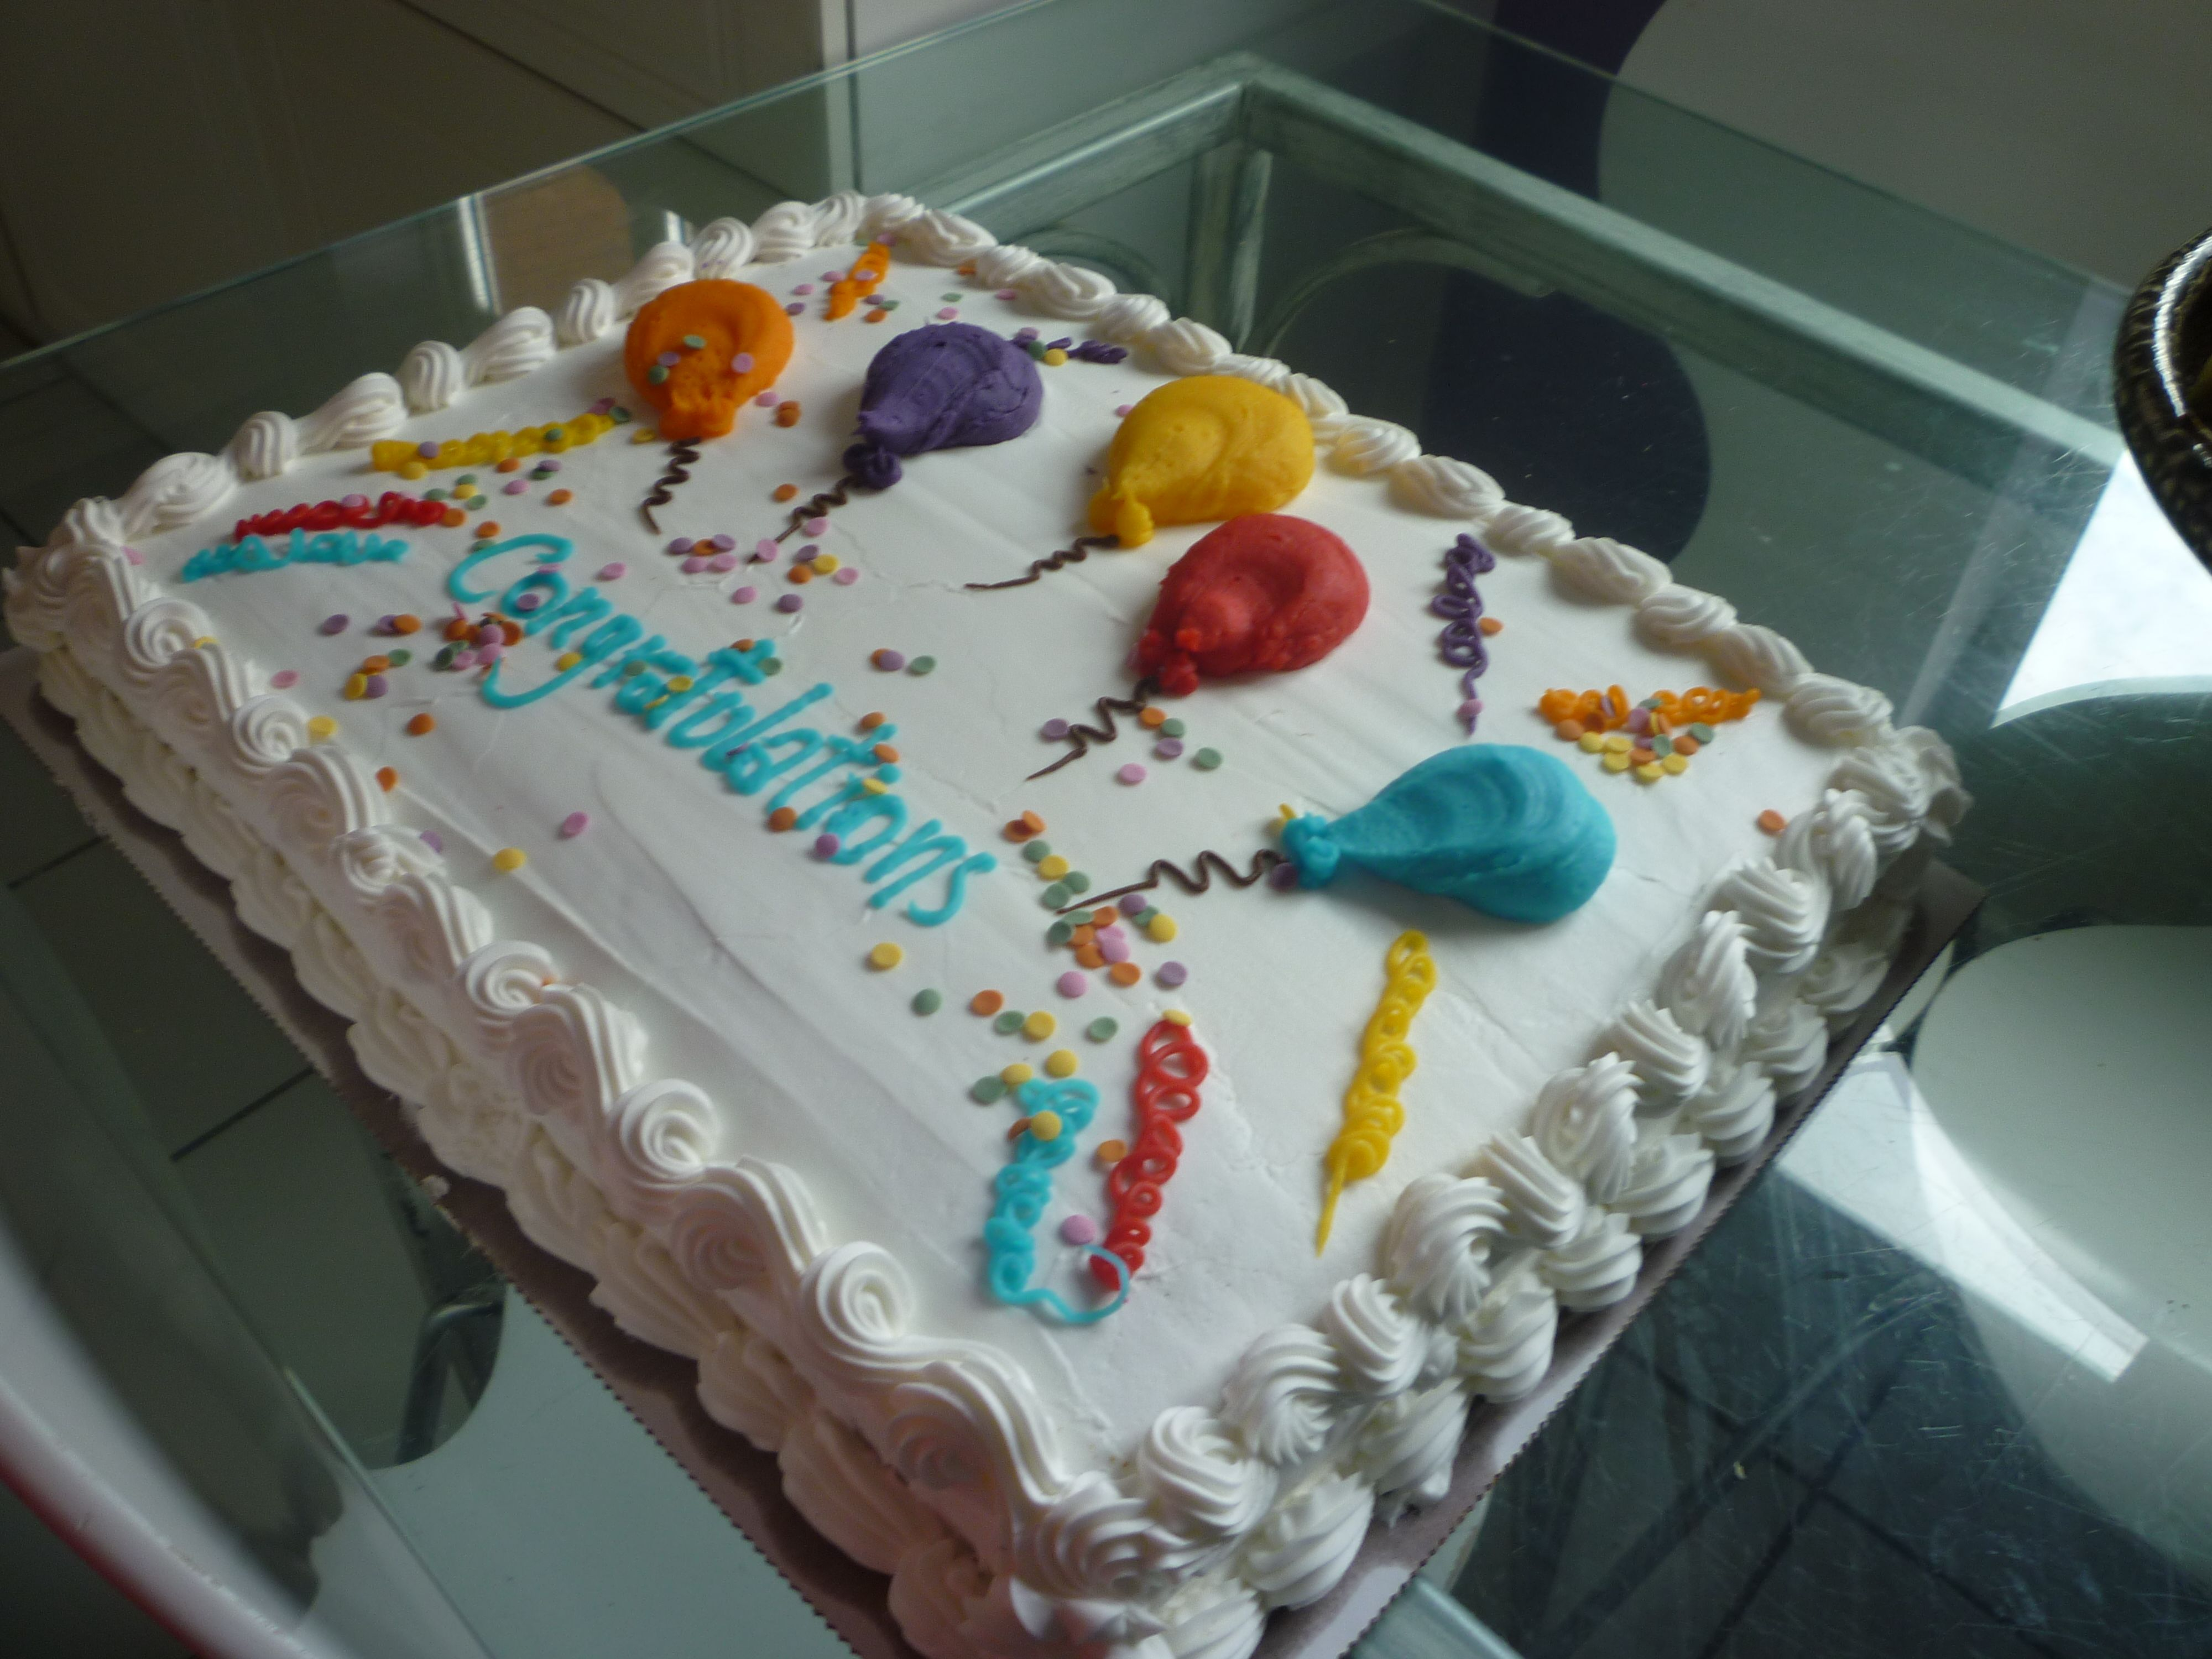 Stupendous 7 Costco Bakery Birthday Cakes Cupcakes Photo Costco Bakery Personalised Birthday Cards Paralily Jamesorg